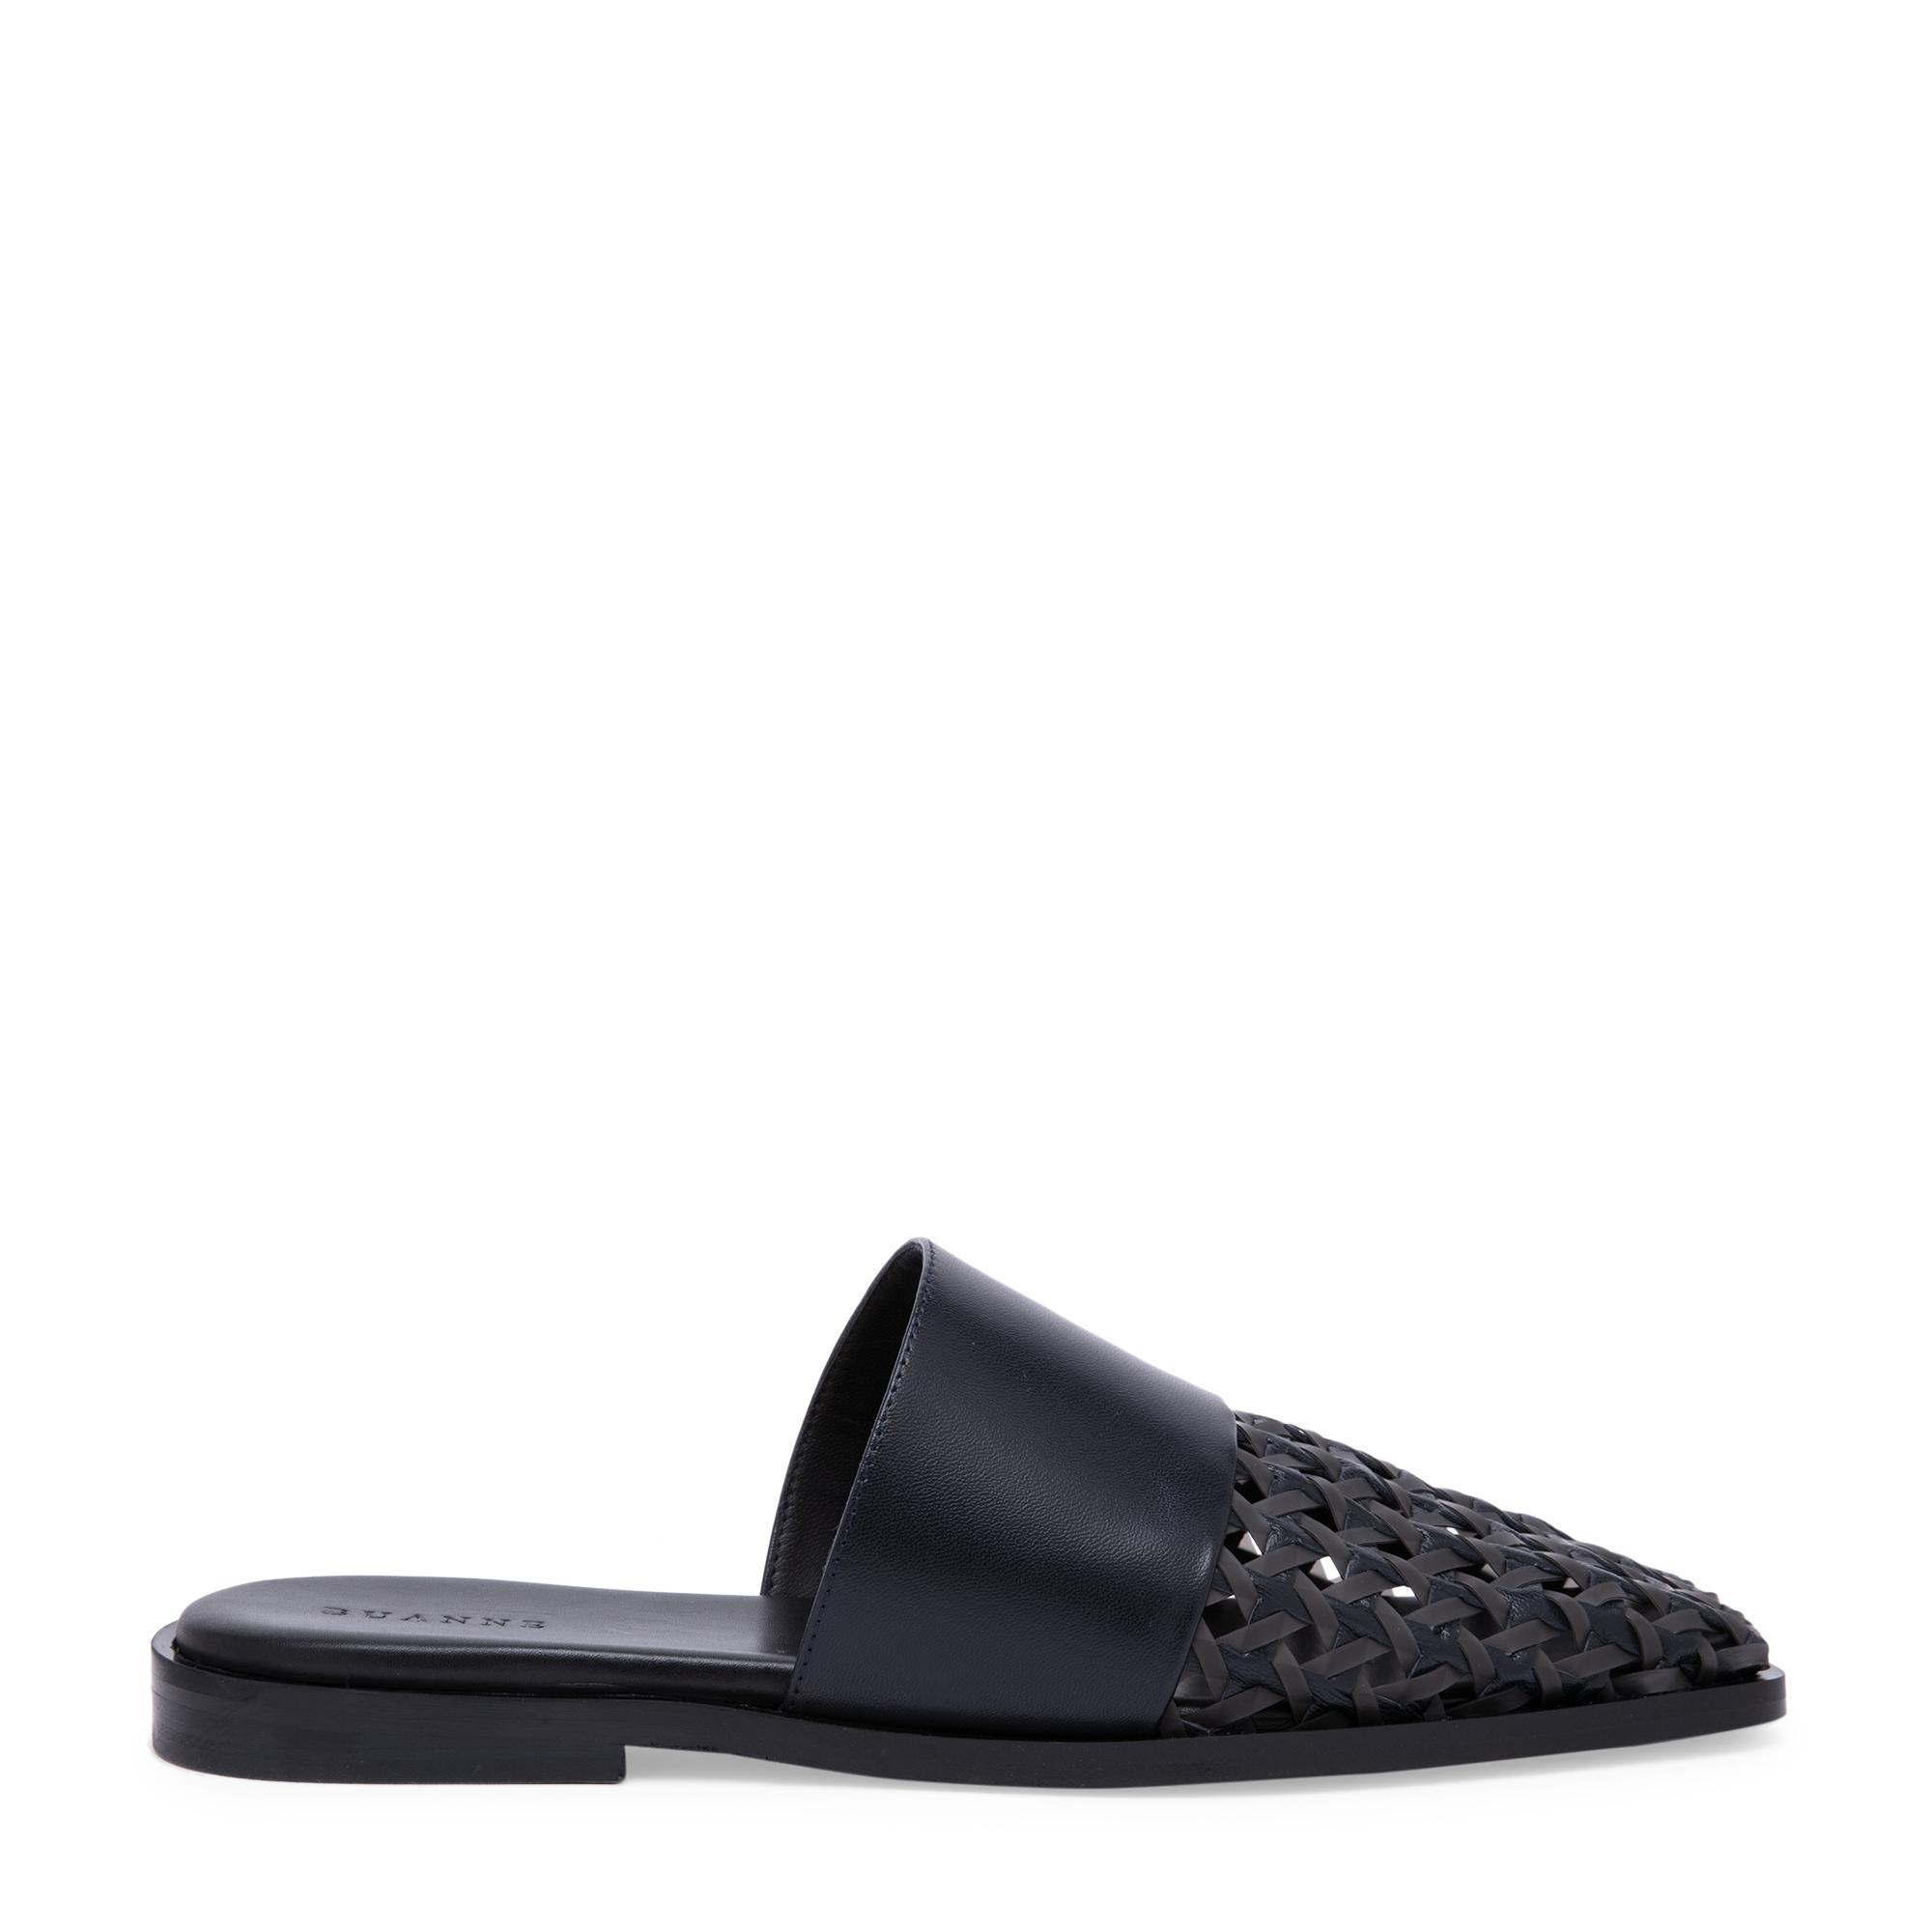 Manco slippers